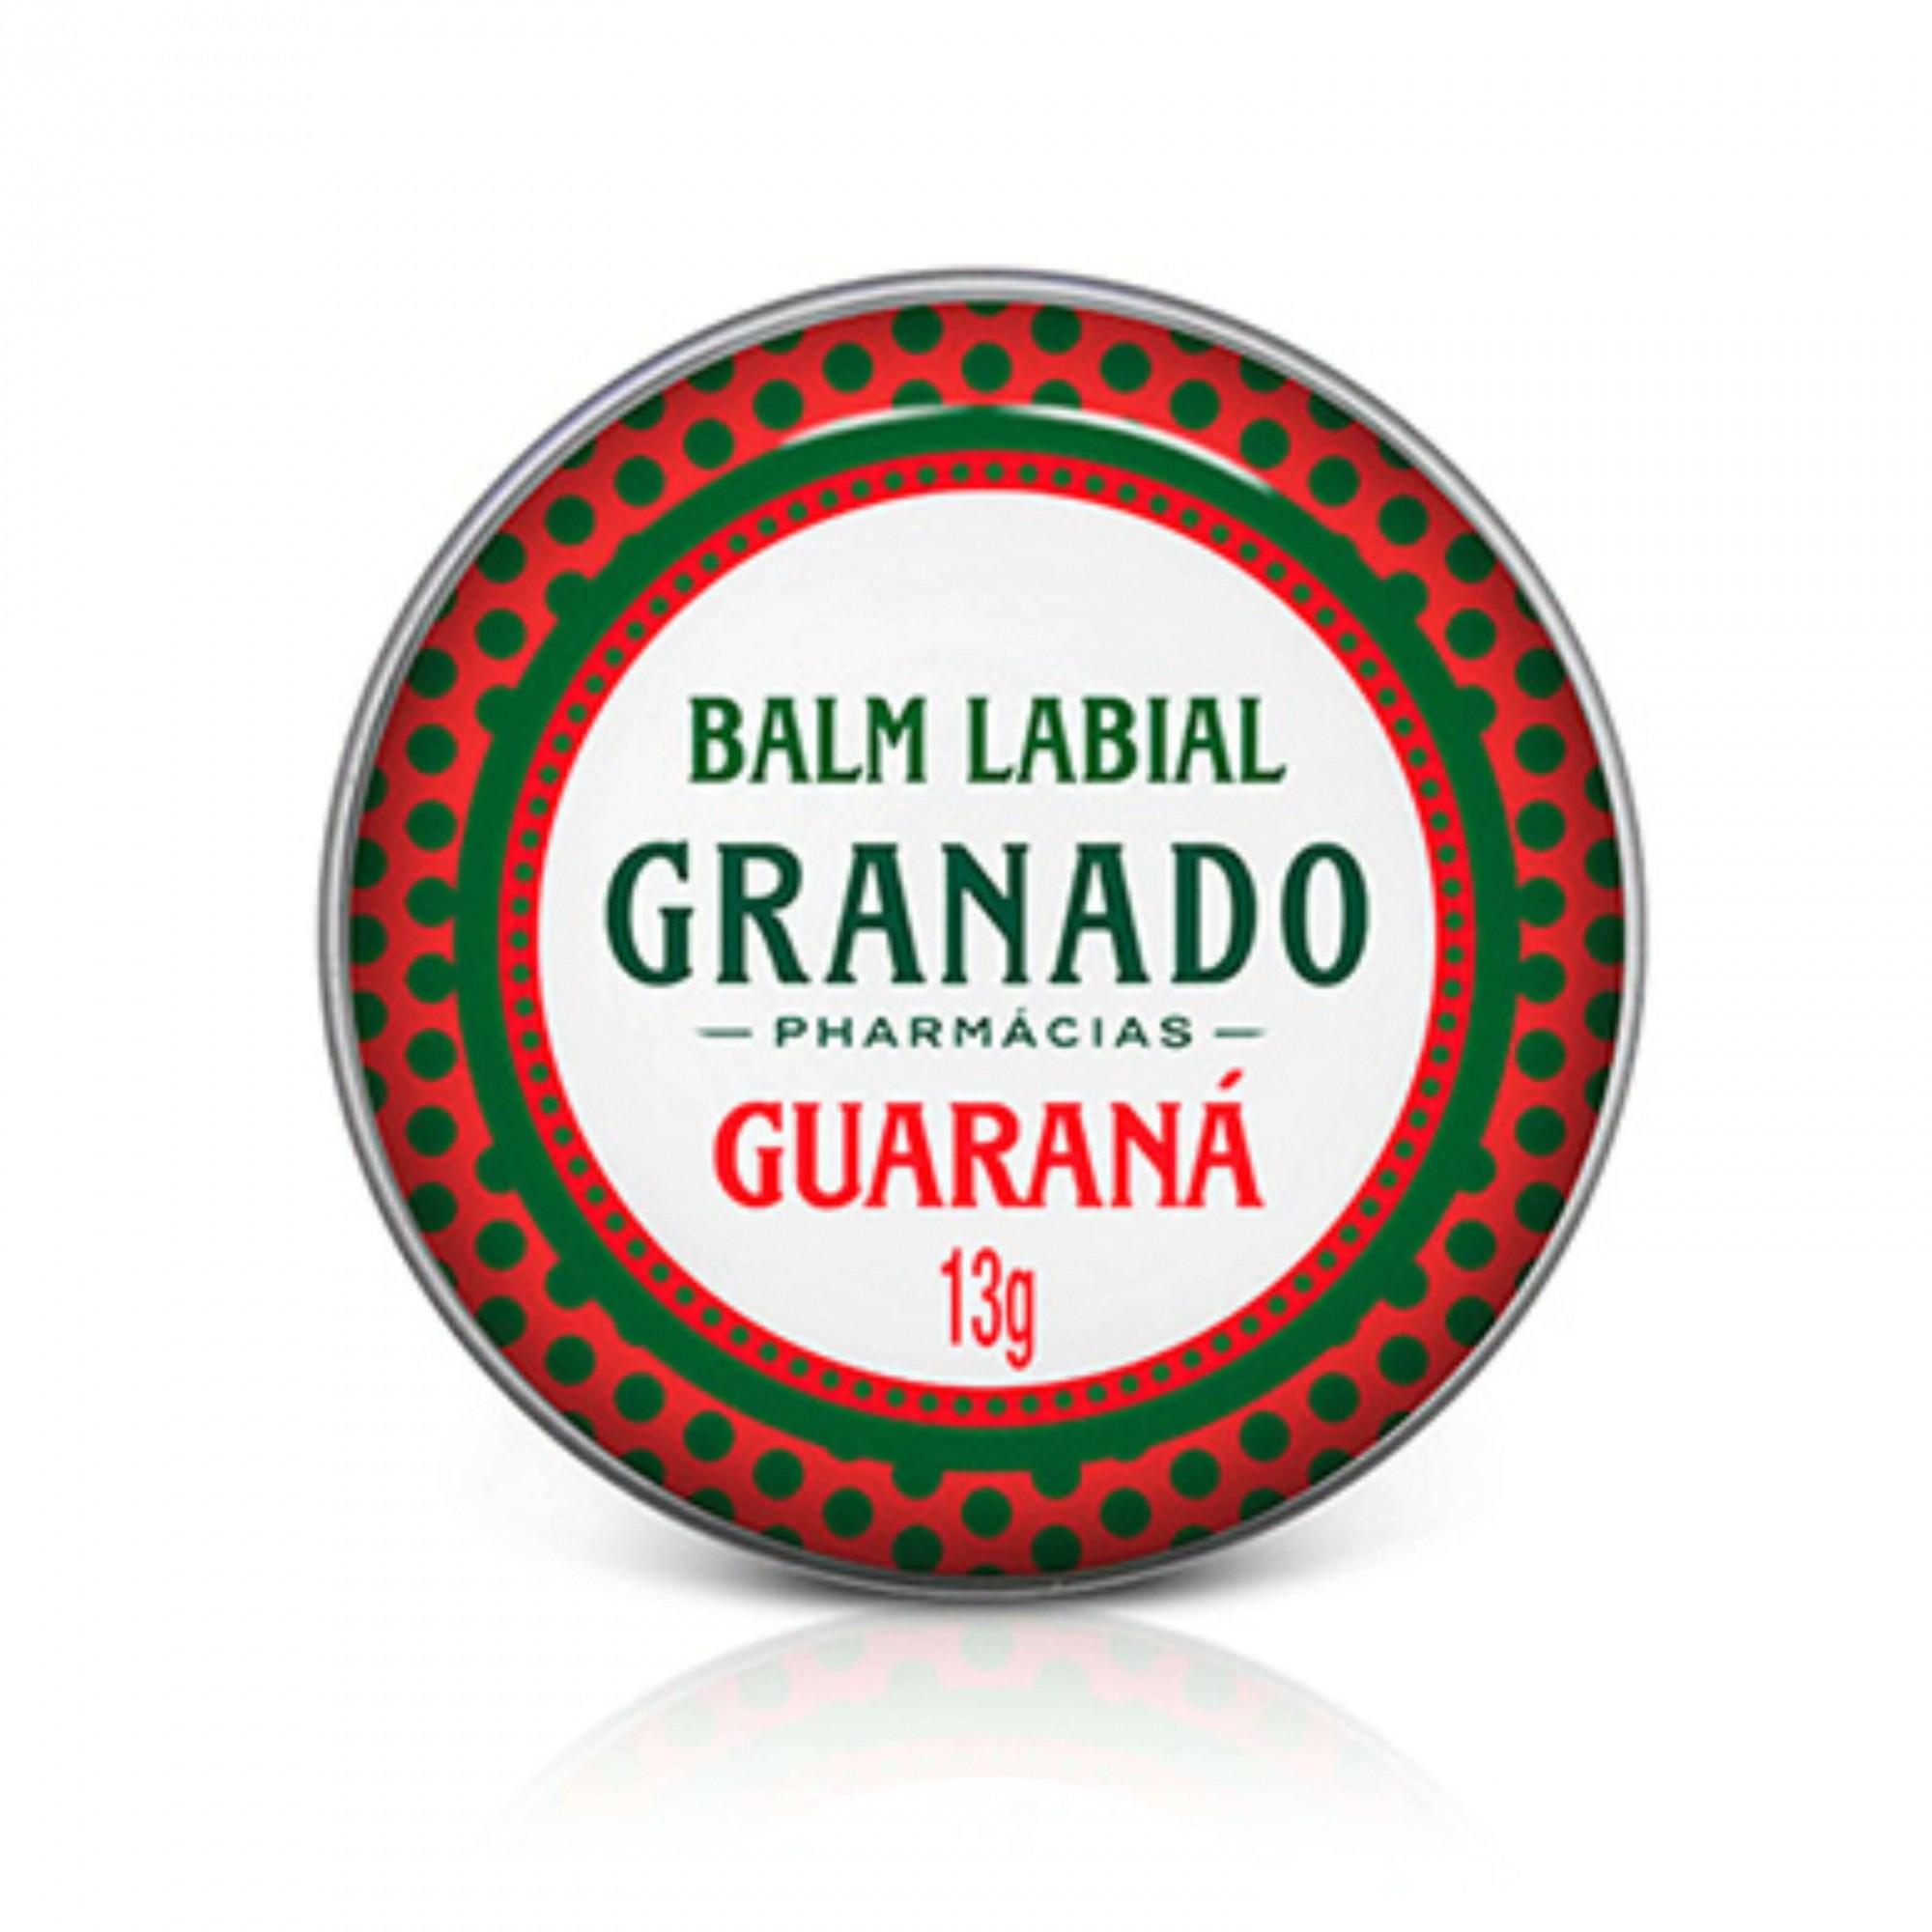 Balm Labial Guaraná 13g